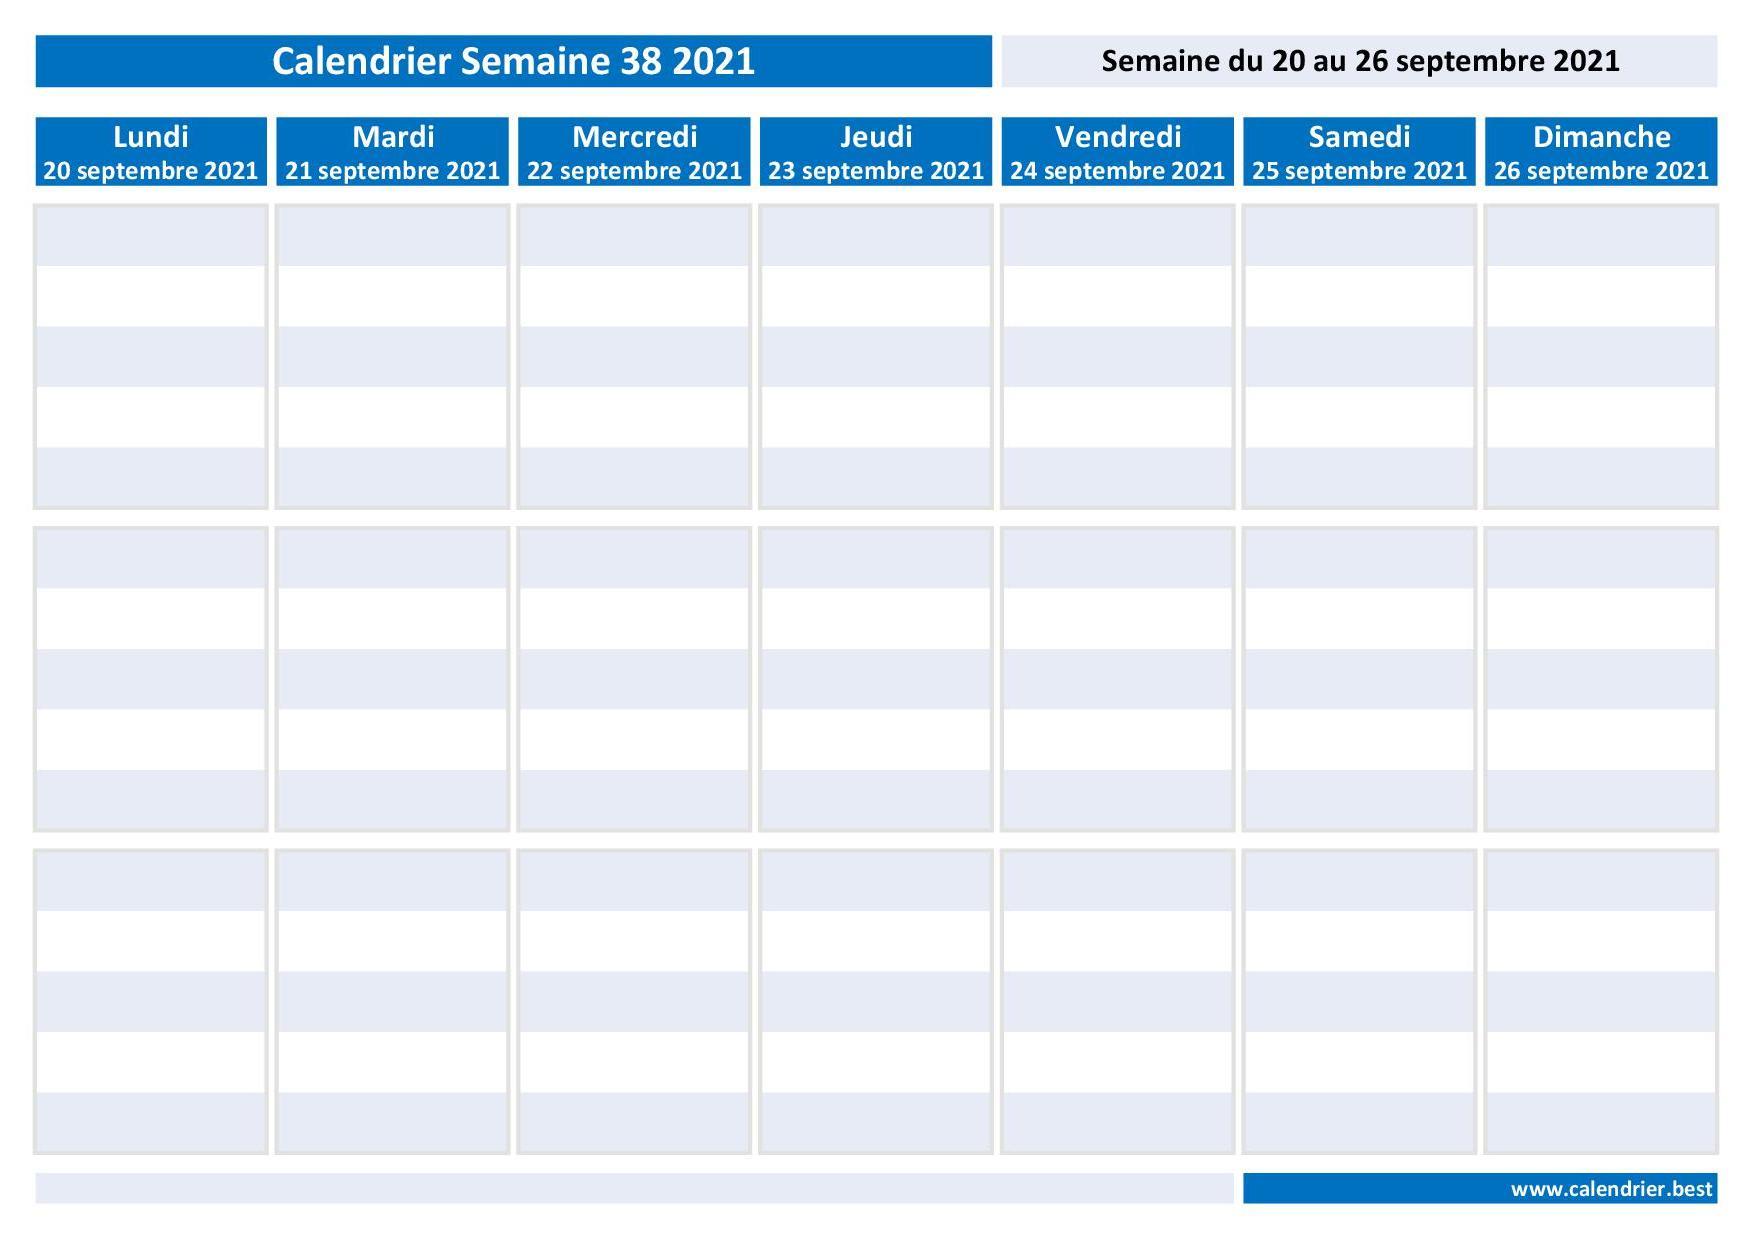 Semaine 38 2021 : dates, calendrier et planning  Calendrier.best